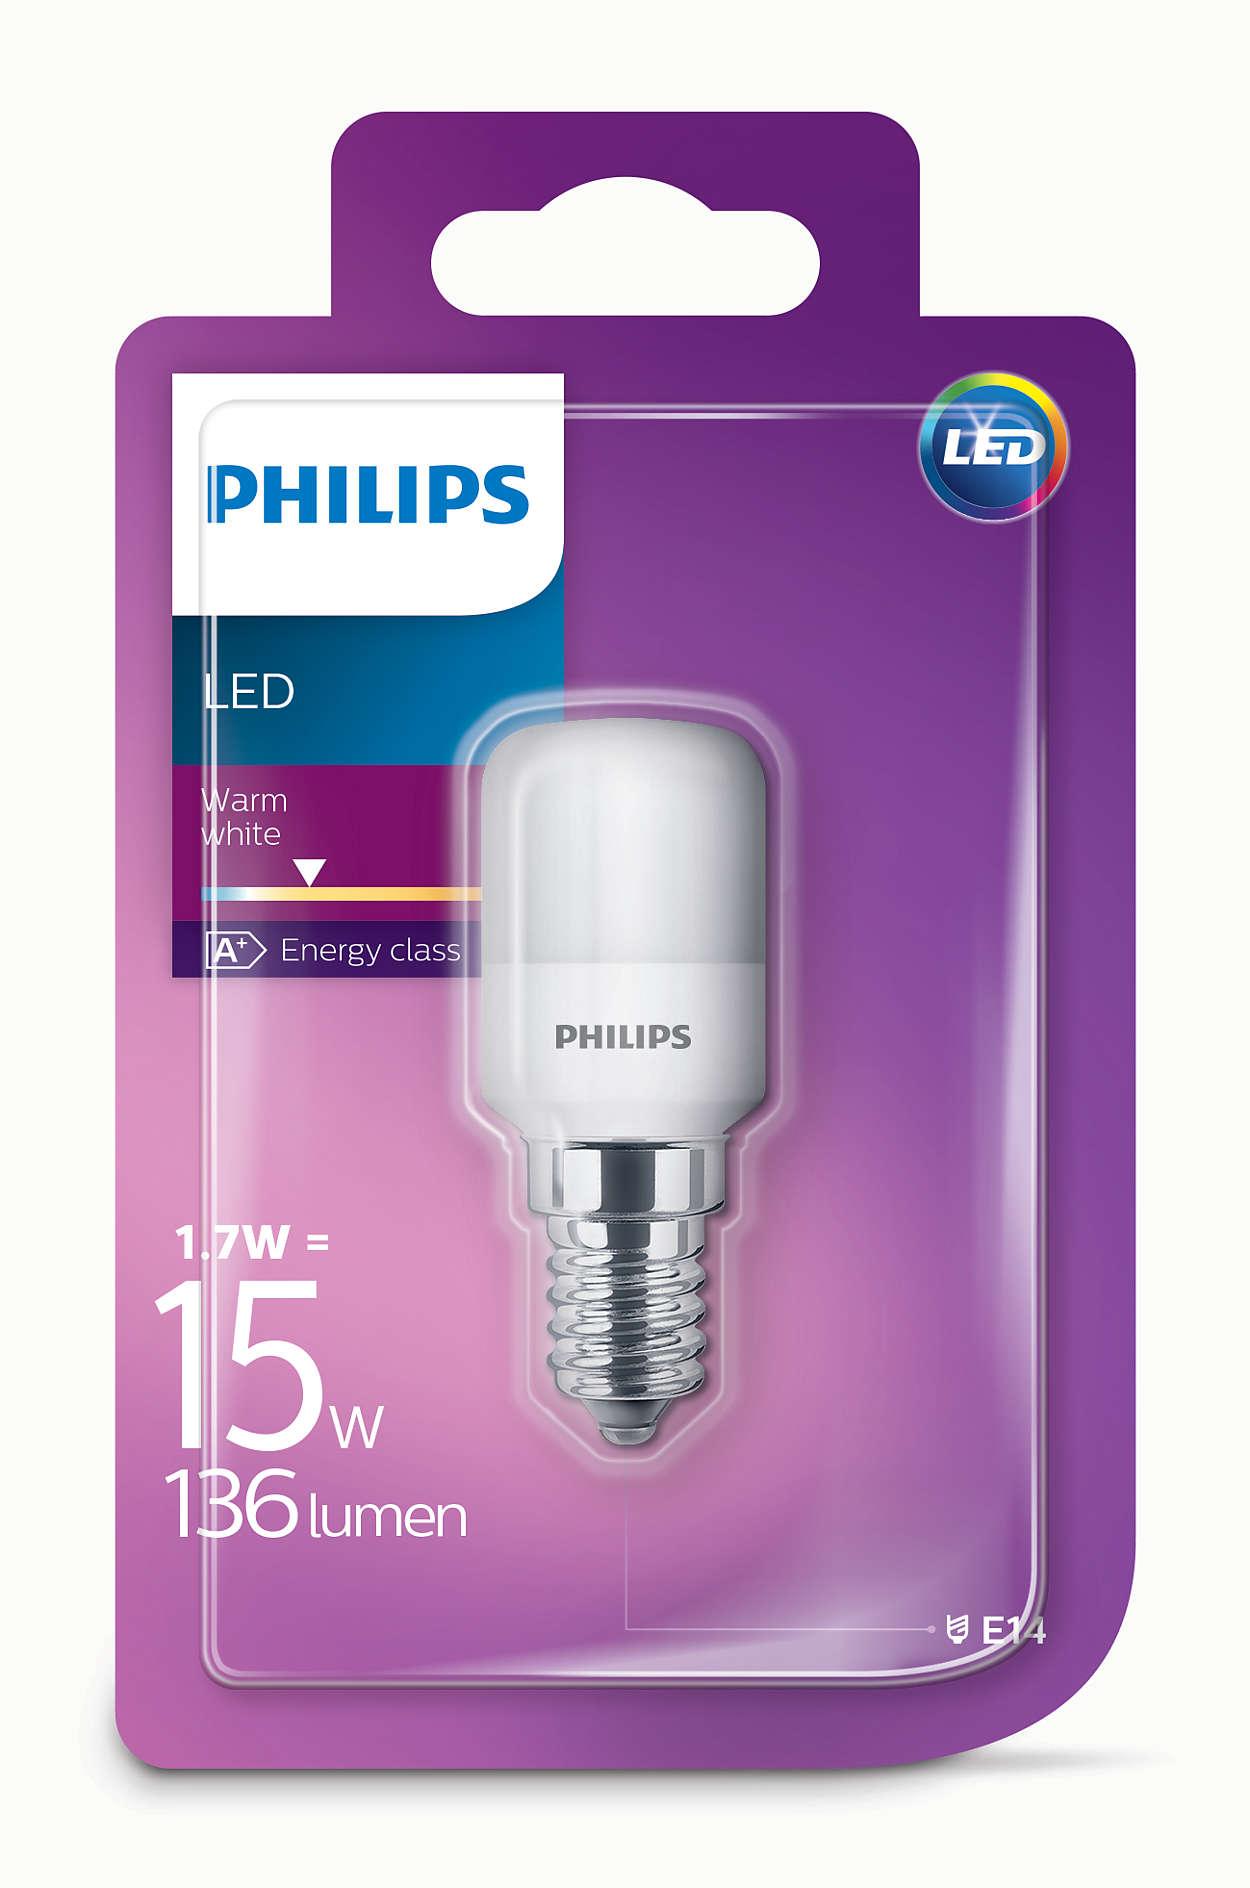 philips led t25 frosted e14 edison screw 15w appliance fridge light bulb 136lm ebay. Black Bedroom Furniture Sets. Home Design Ideas